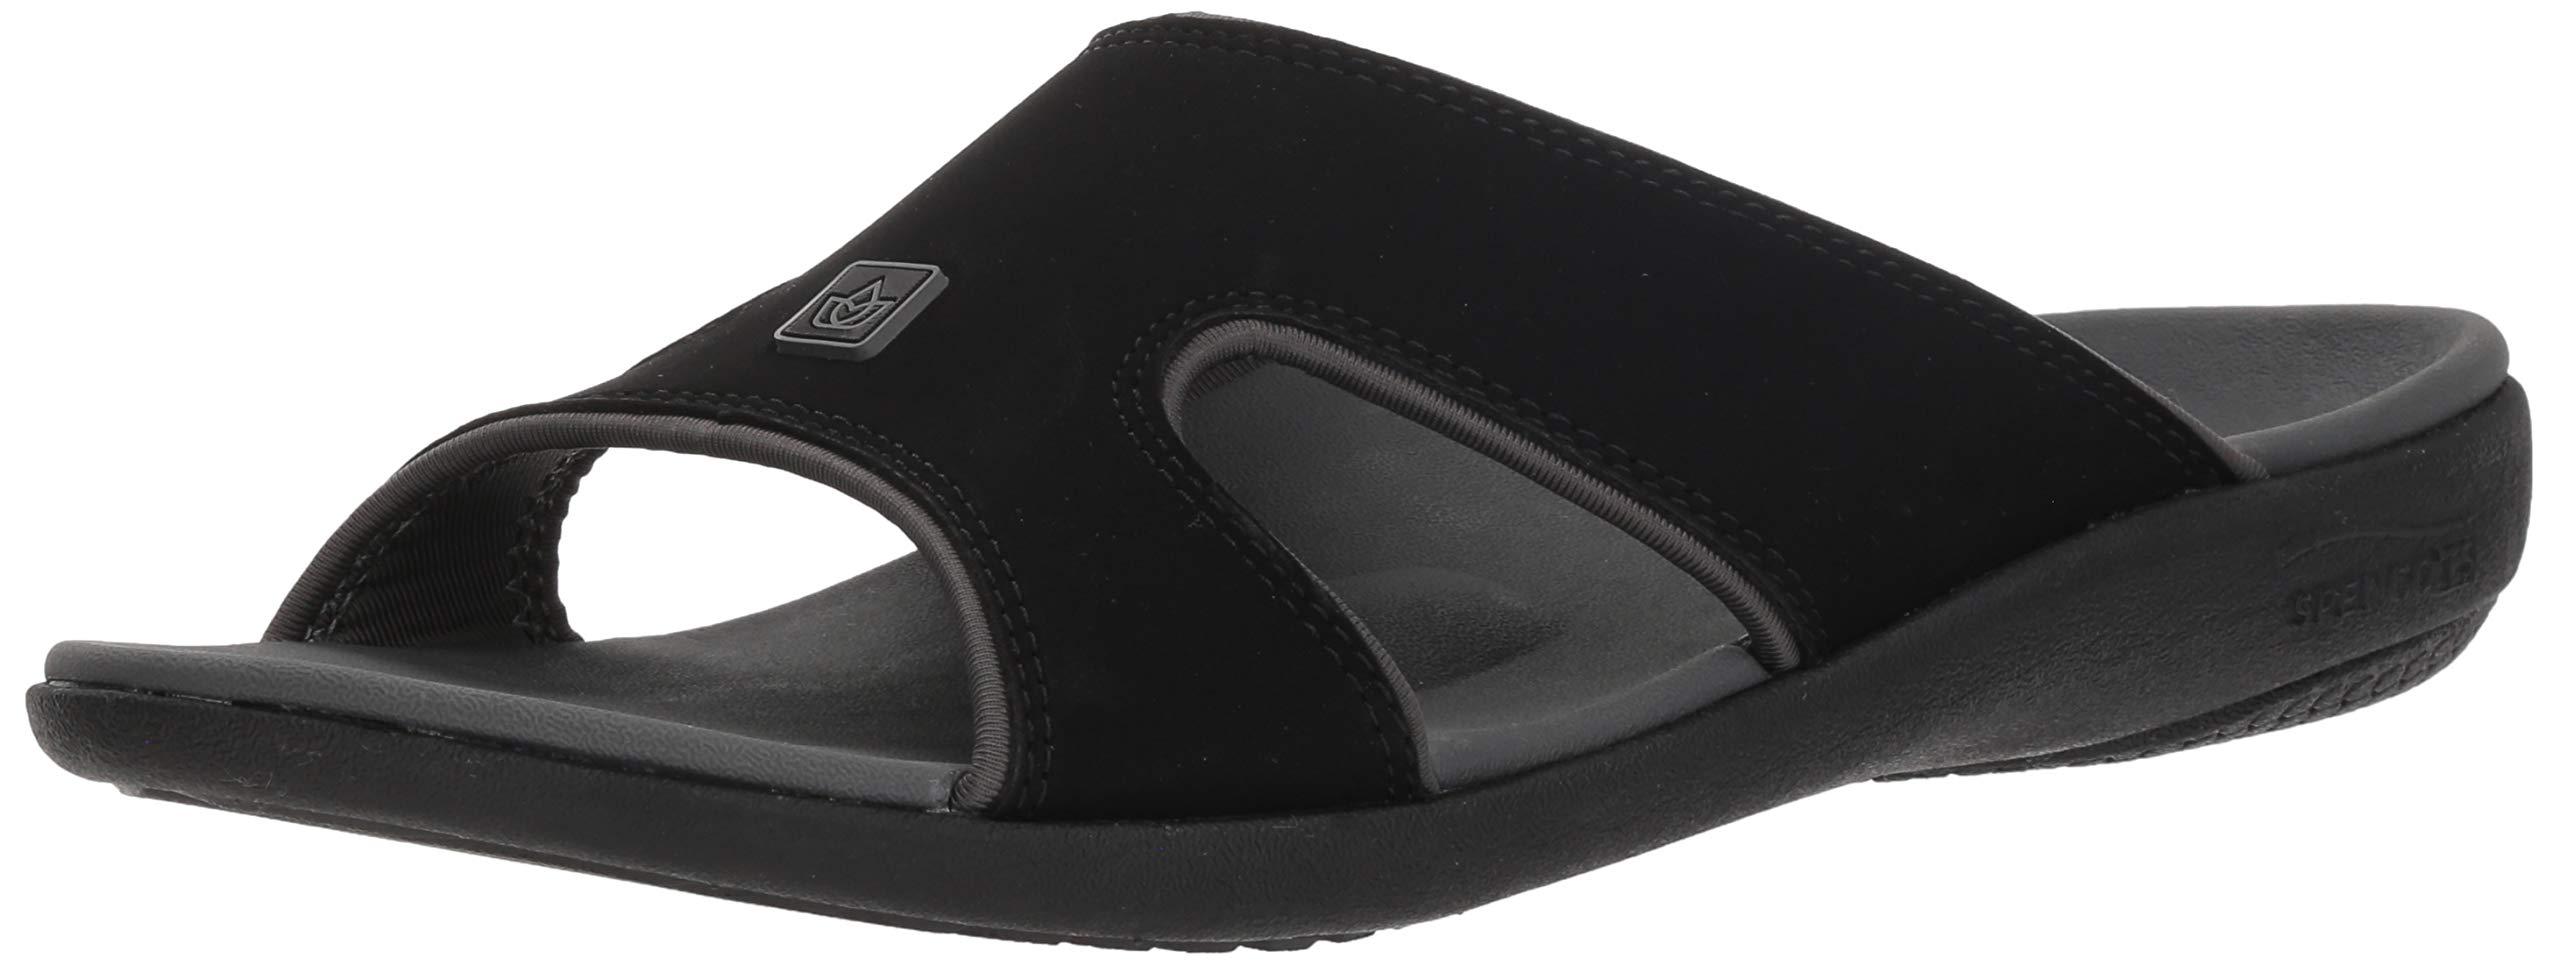 Spenco Men's Kholo Plus Slide Sandal, Carbon/Pewter, 14 Medium US